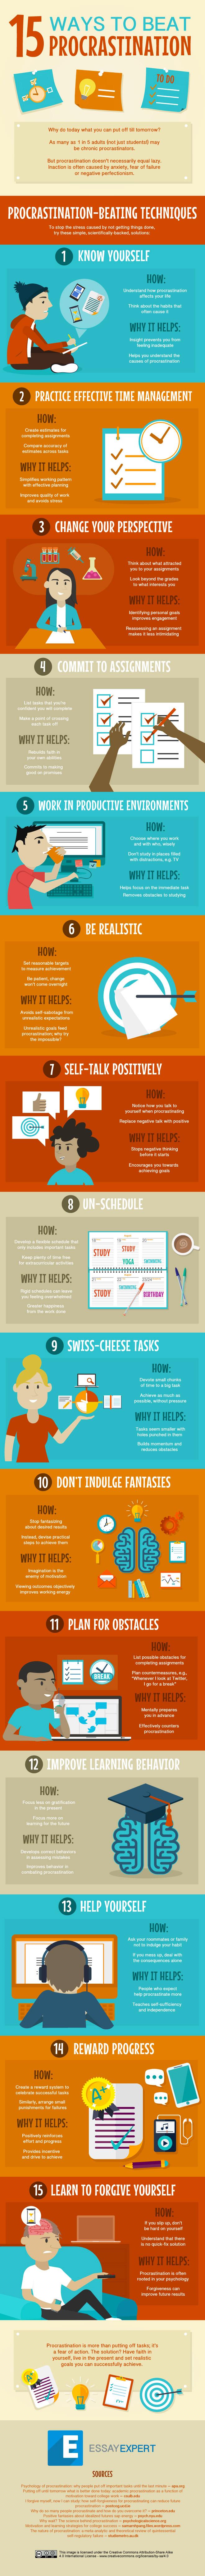 15 Ways to Beat Procrastination Image